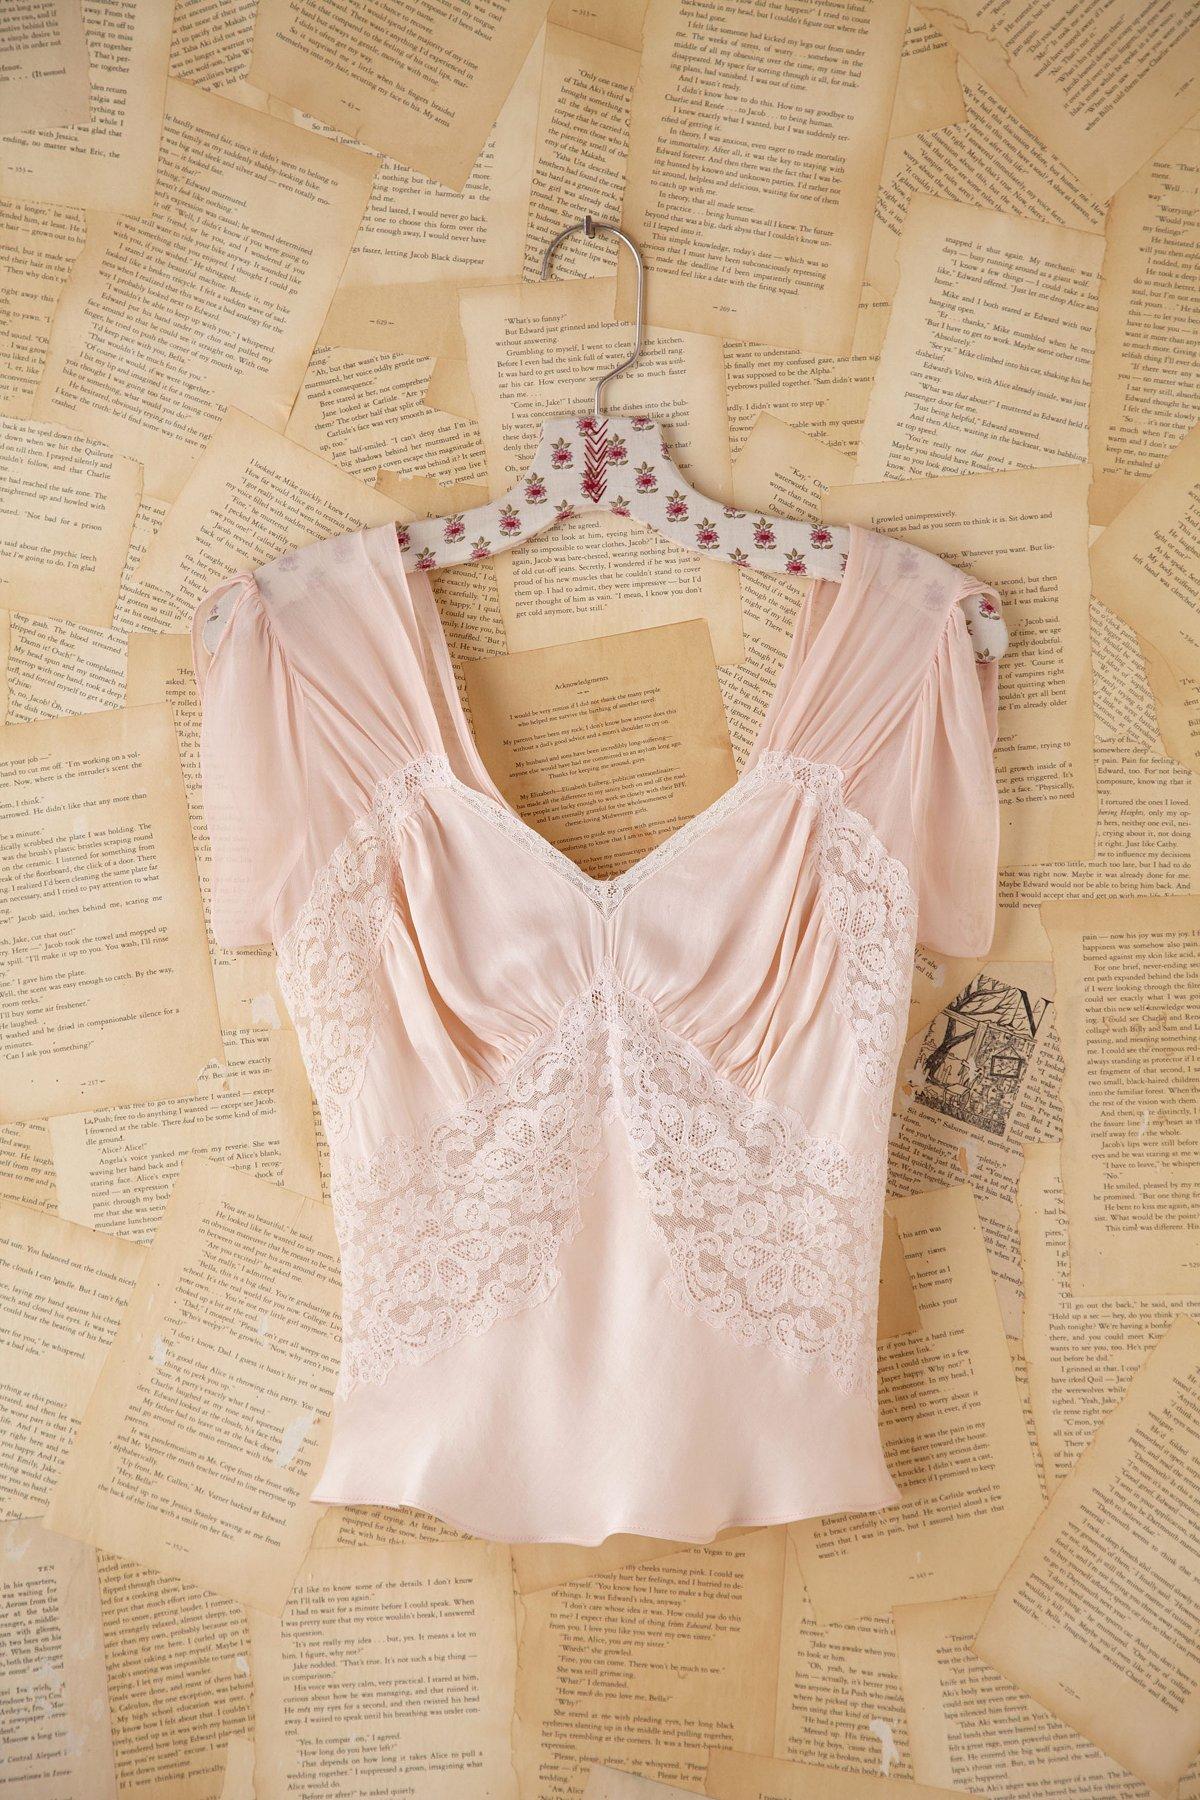 Vintage 1930s Camisole